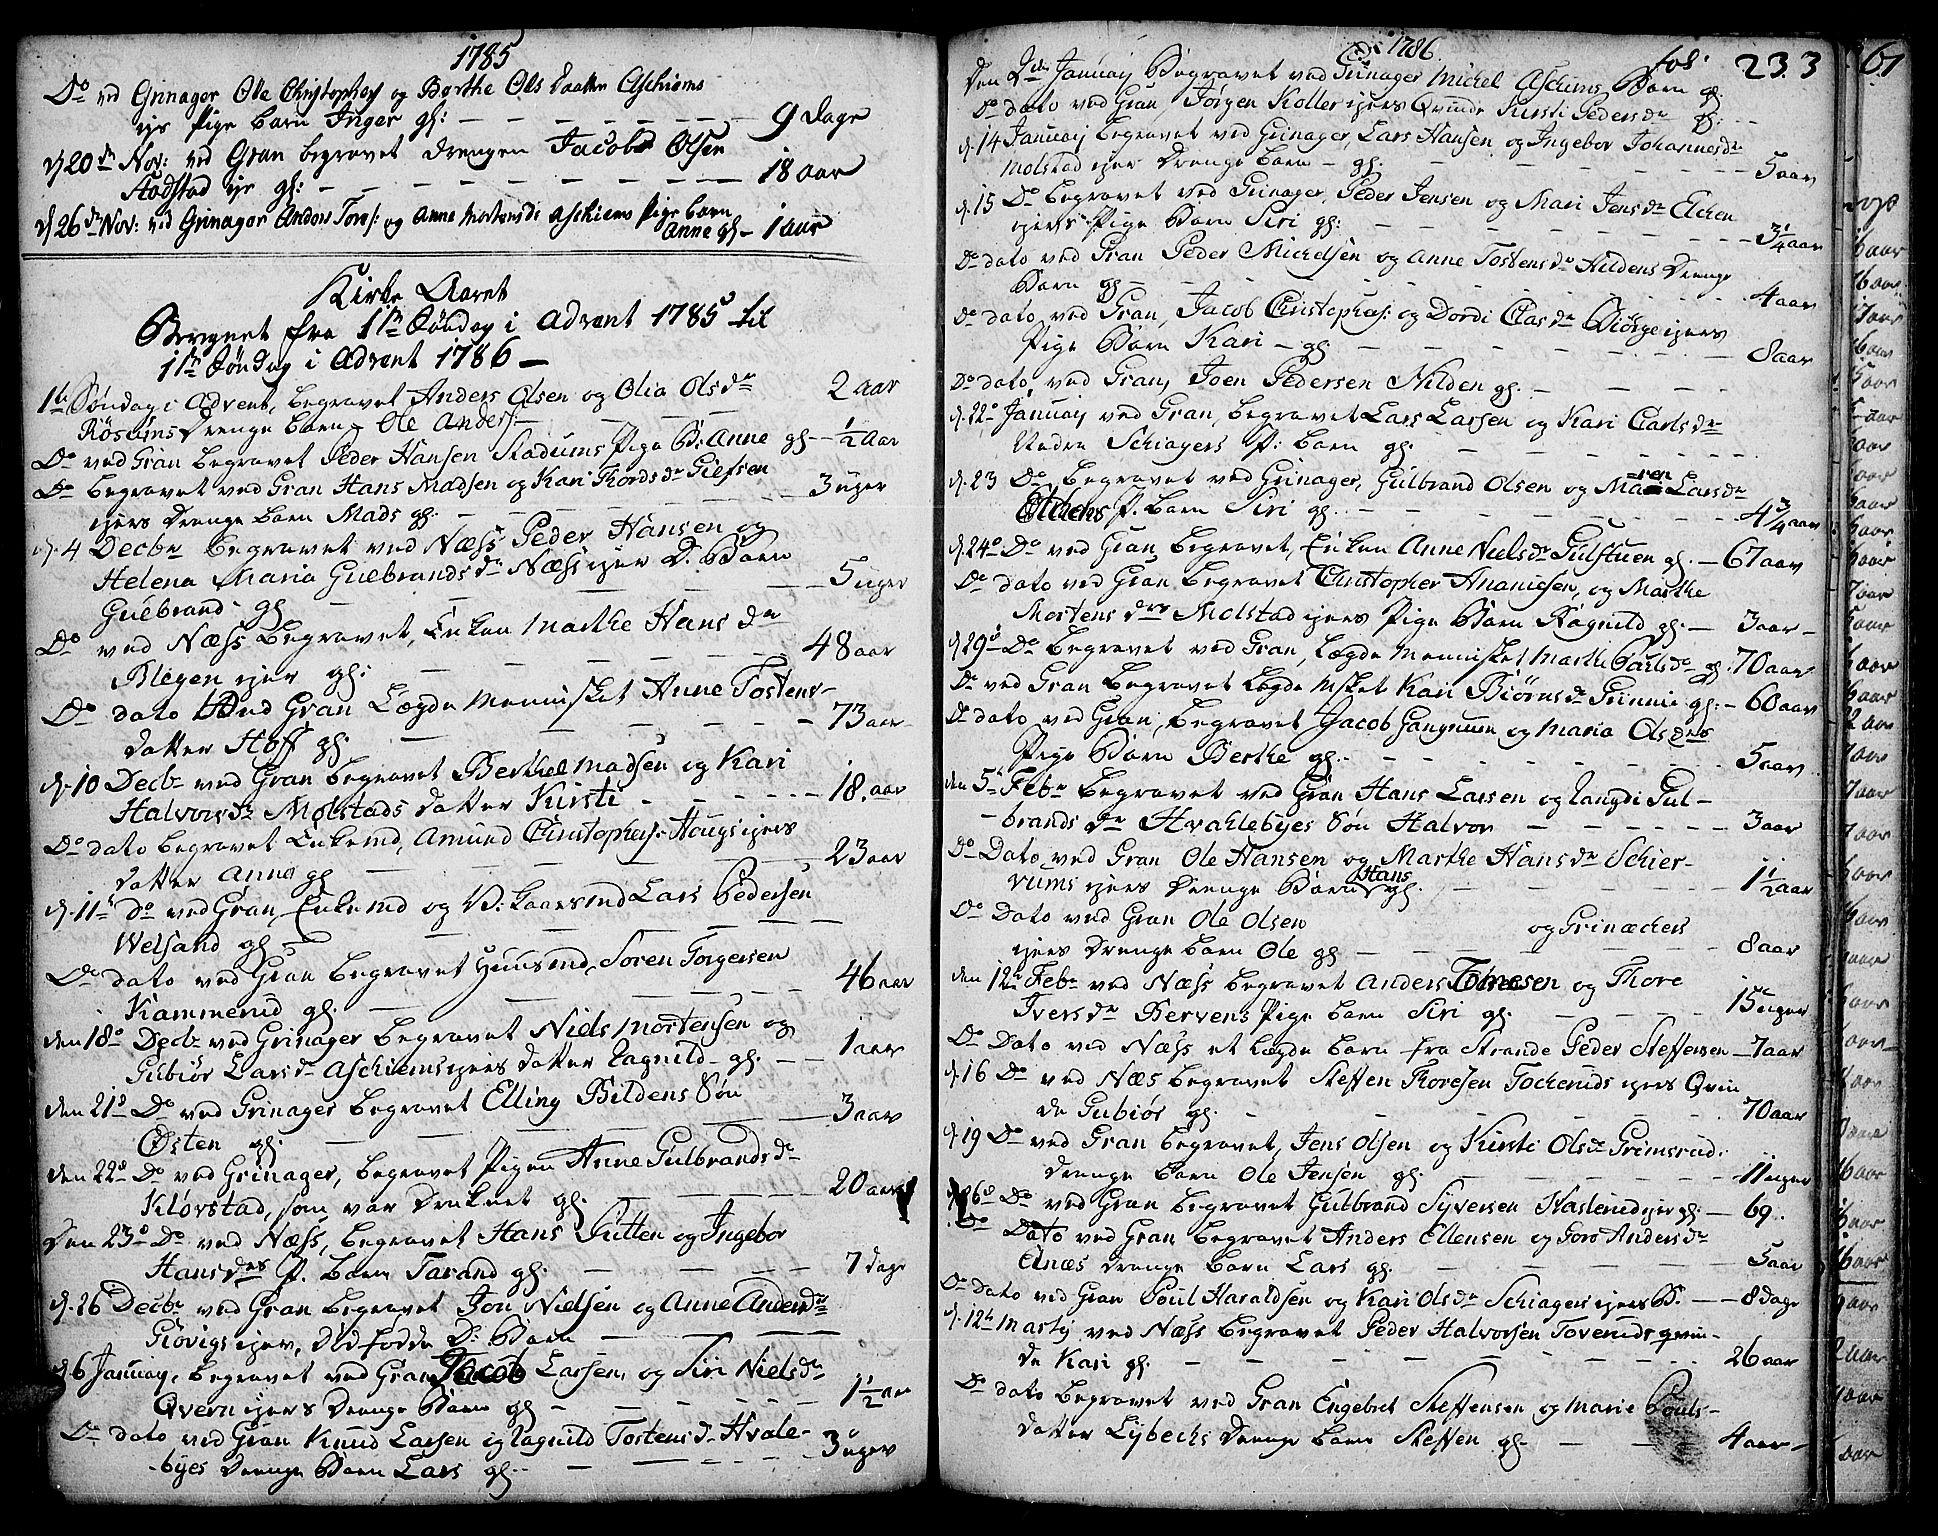 SAH, Gran prestekontor, Ministerialbok nr. 5, 1776-1788, s. 233